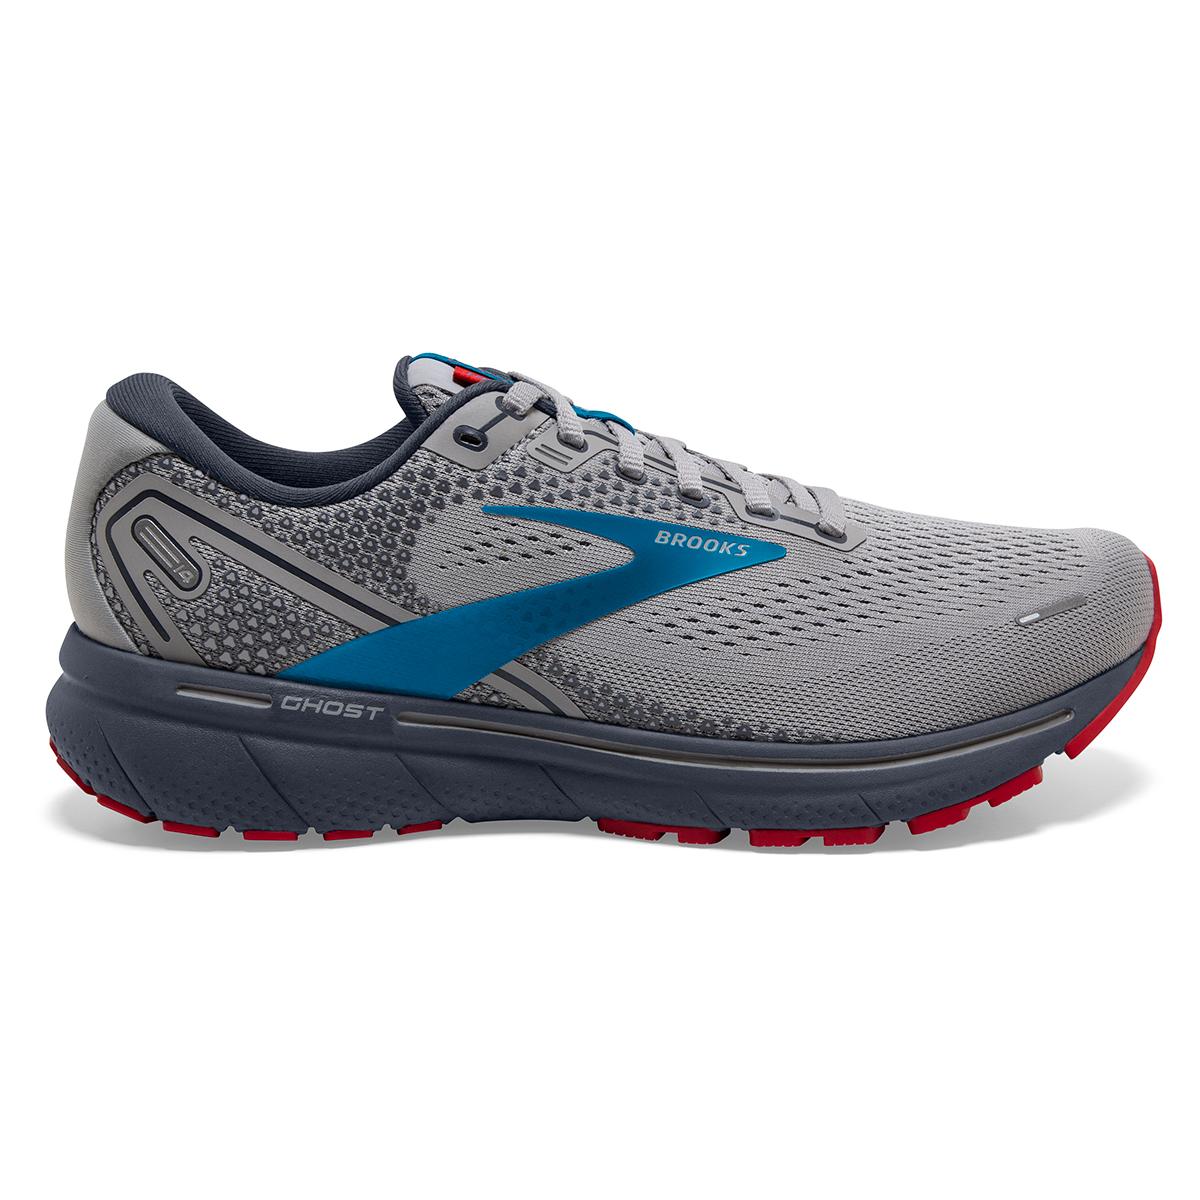 Men's Brooks Ghost 14 Running Shoe - Color: Grey/Blue/Red - Size: 7 - Width: Regular, Grey/Blue/Red, large, image 1